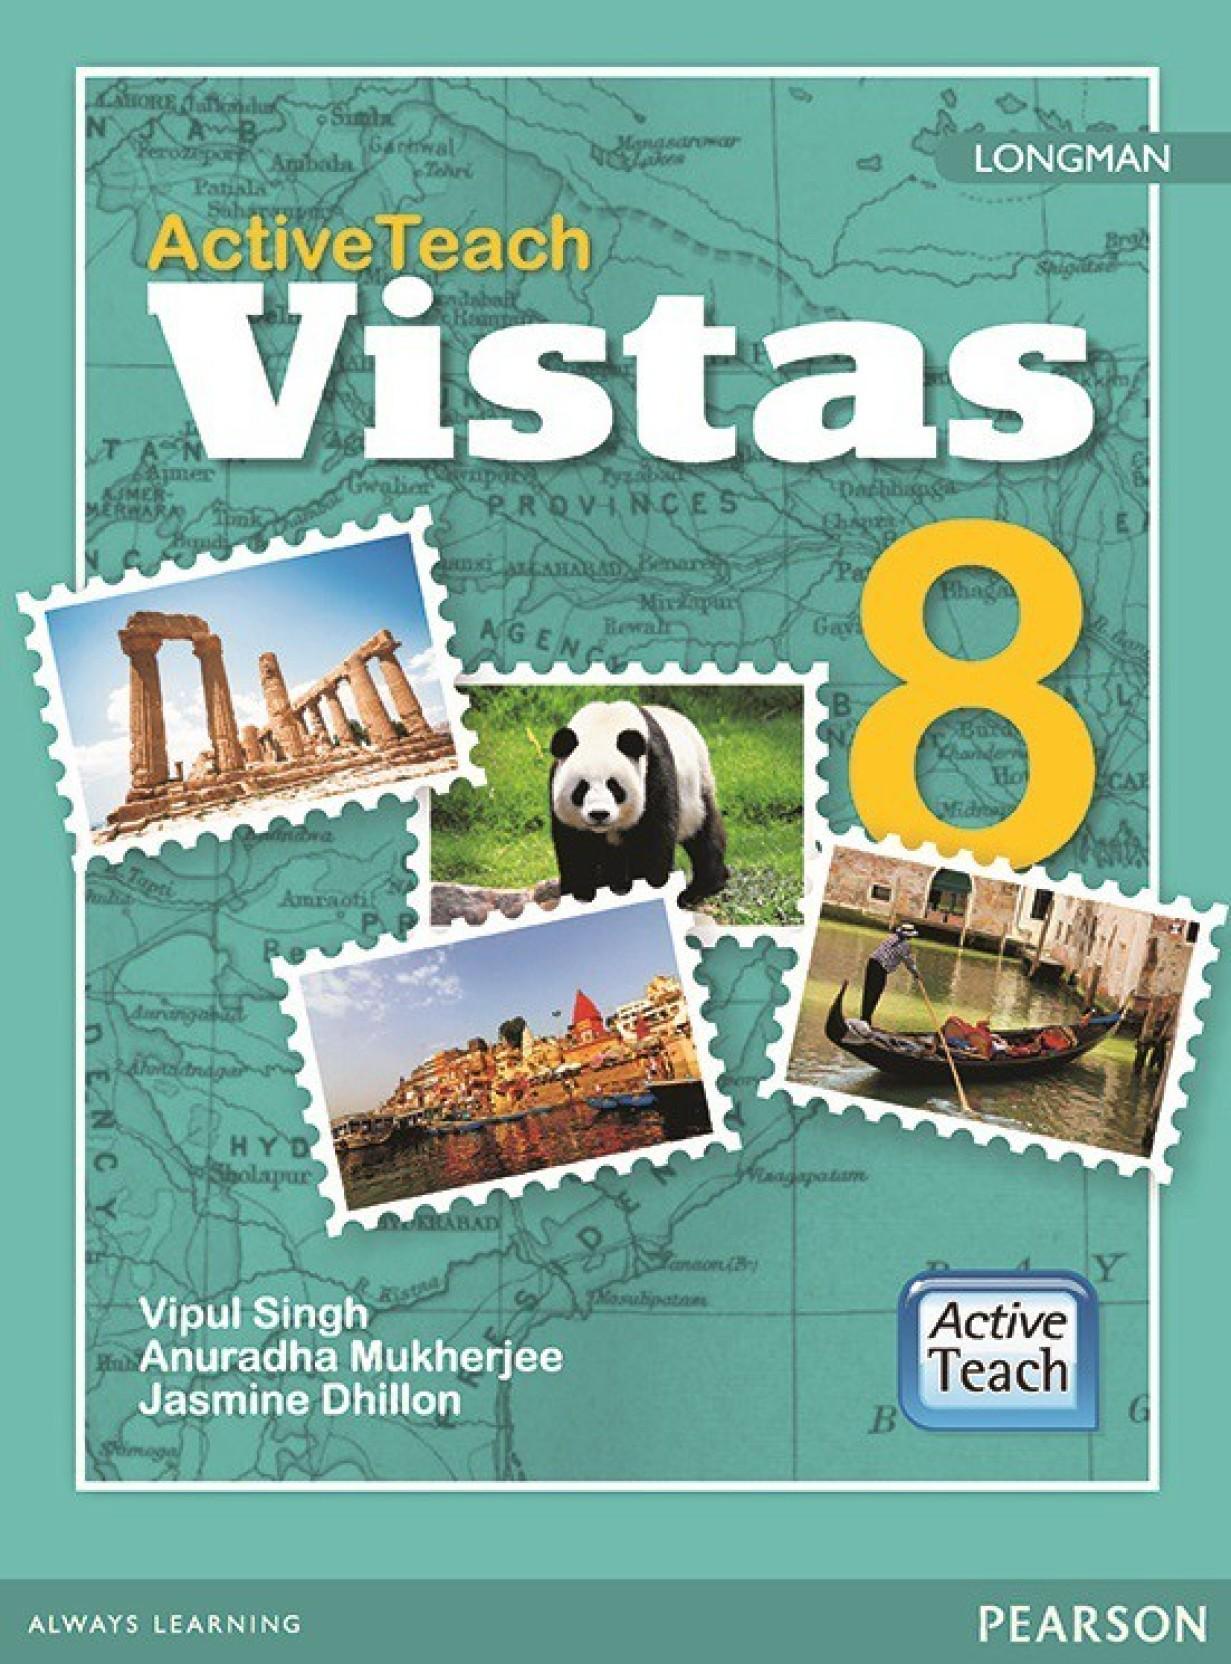 ... Longman Vistas - Social Studies for CBSE class 8 by Pearson. ADD TO CART